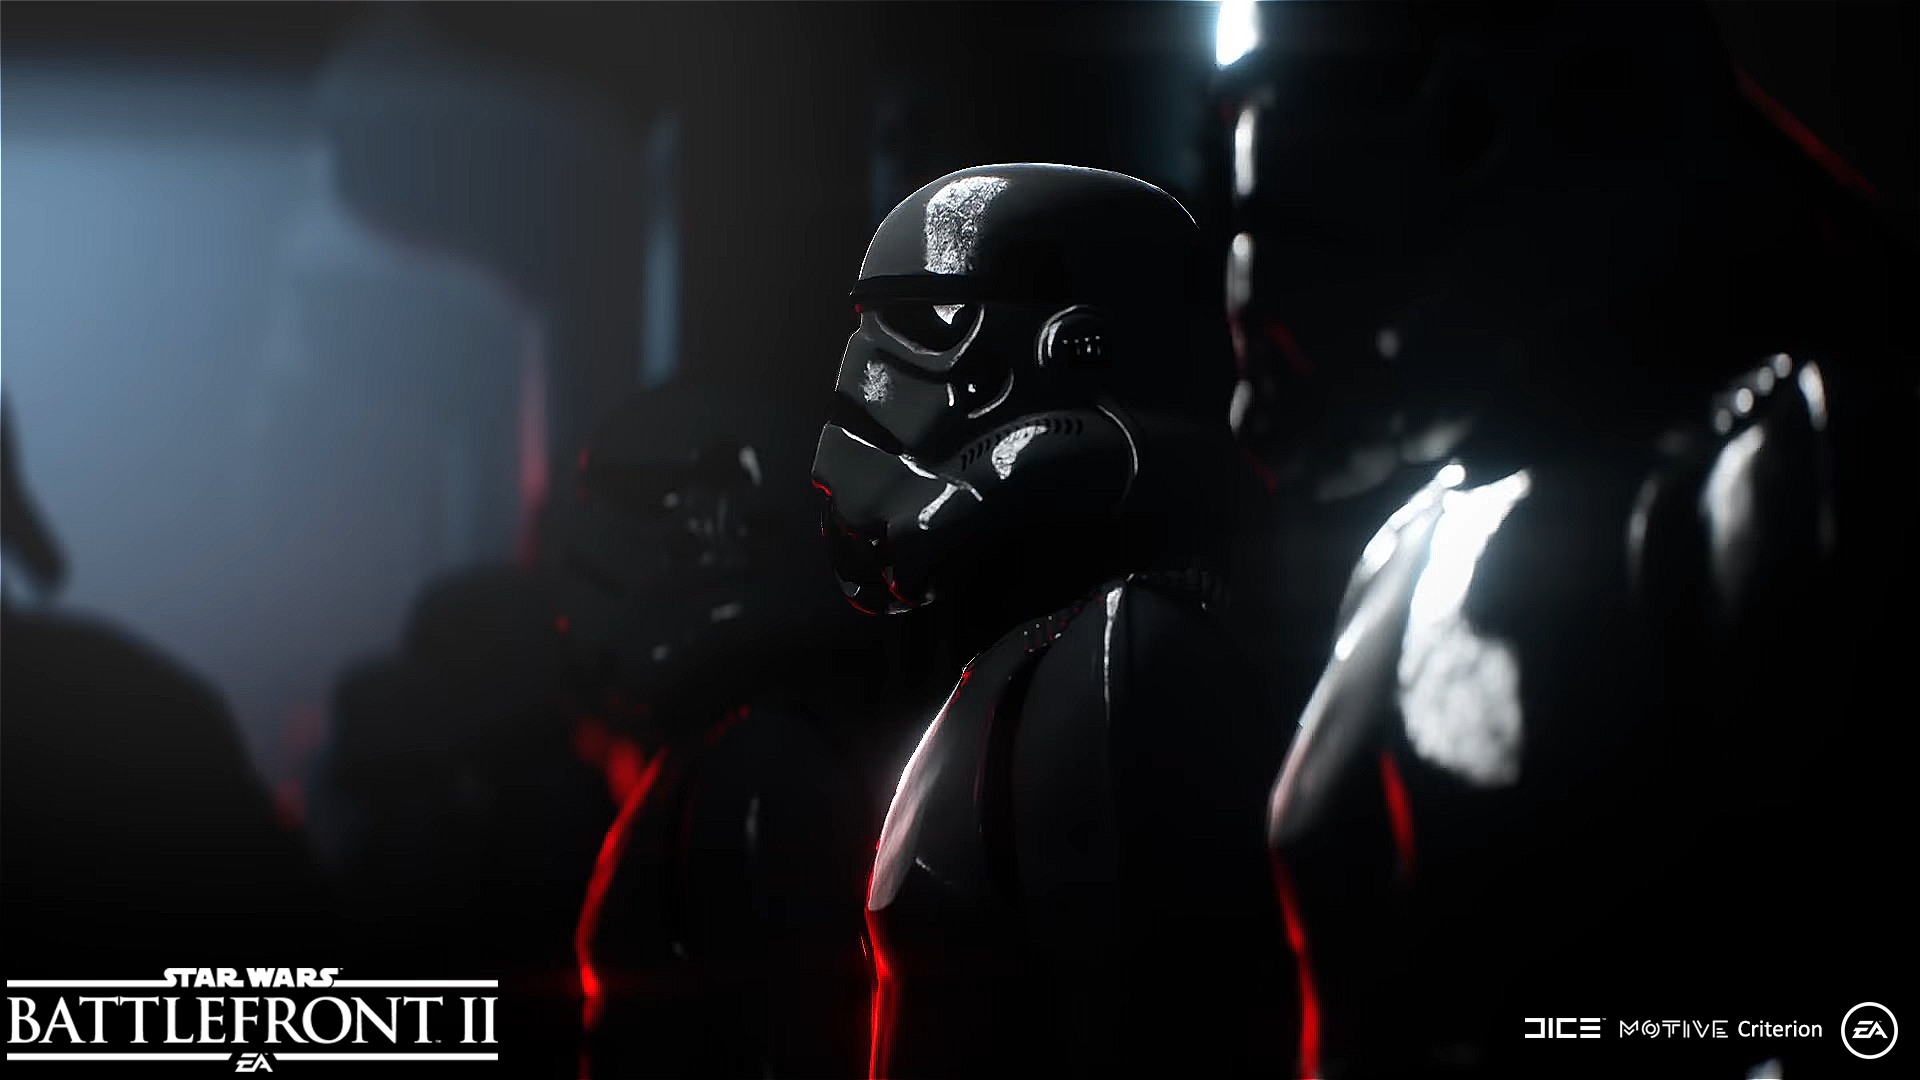 Star Wars Battlefront Ii Wallpaper Stormtrooper By Yume3413 On